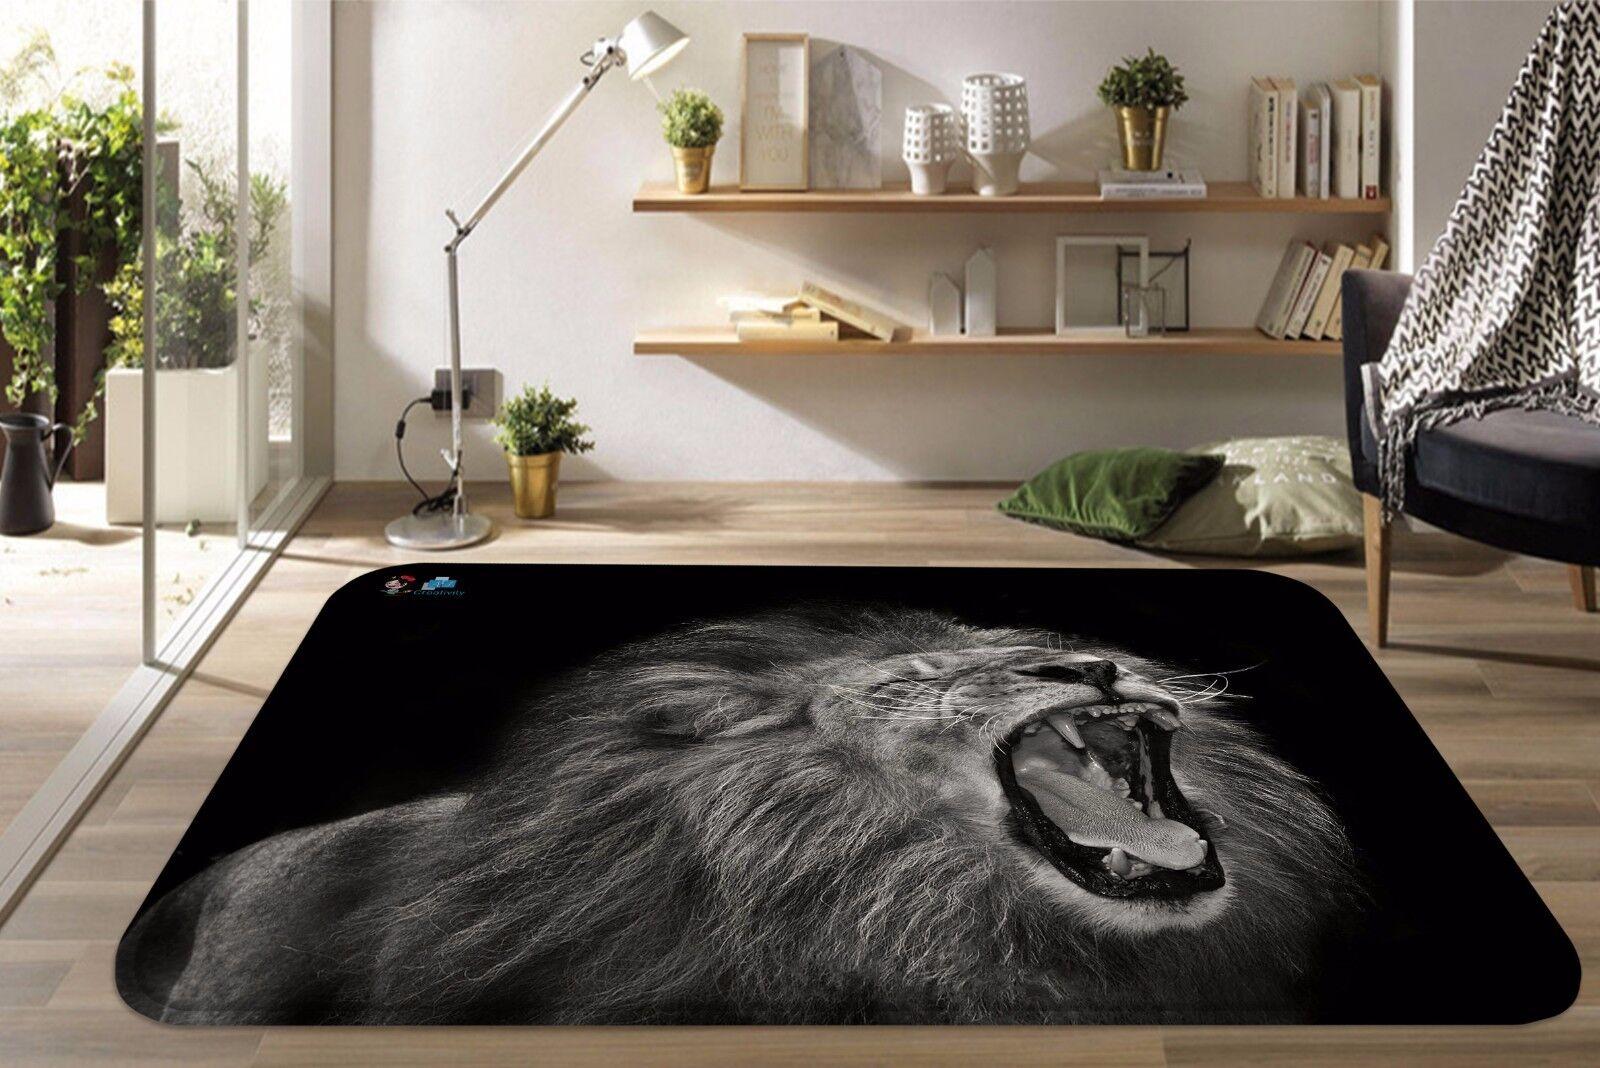 3D Animal Leone 46 tappetino antiscivolo tappeto camera Tappetino Qualità Elegante foto Tappeto UK